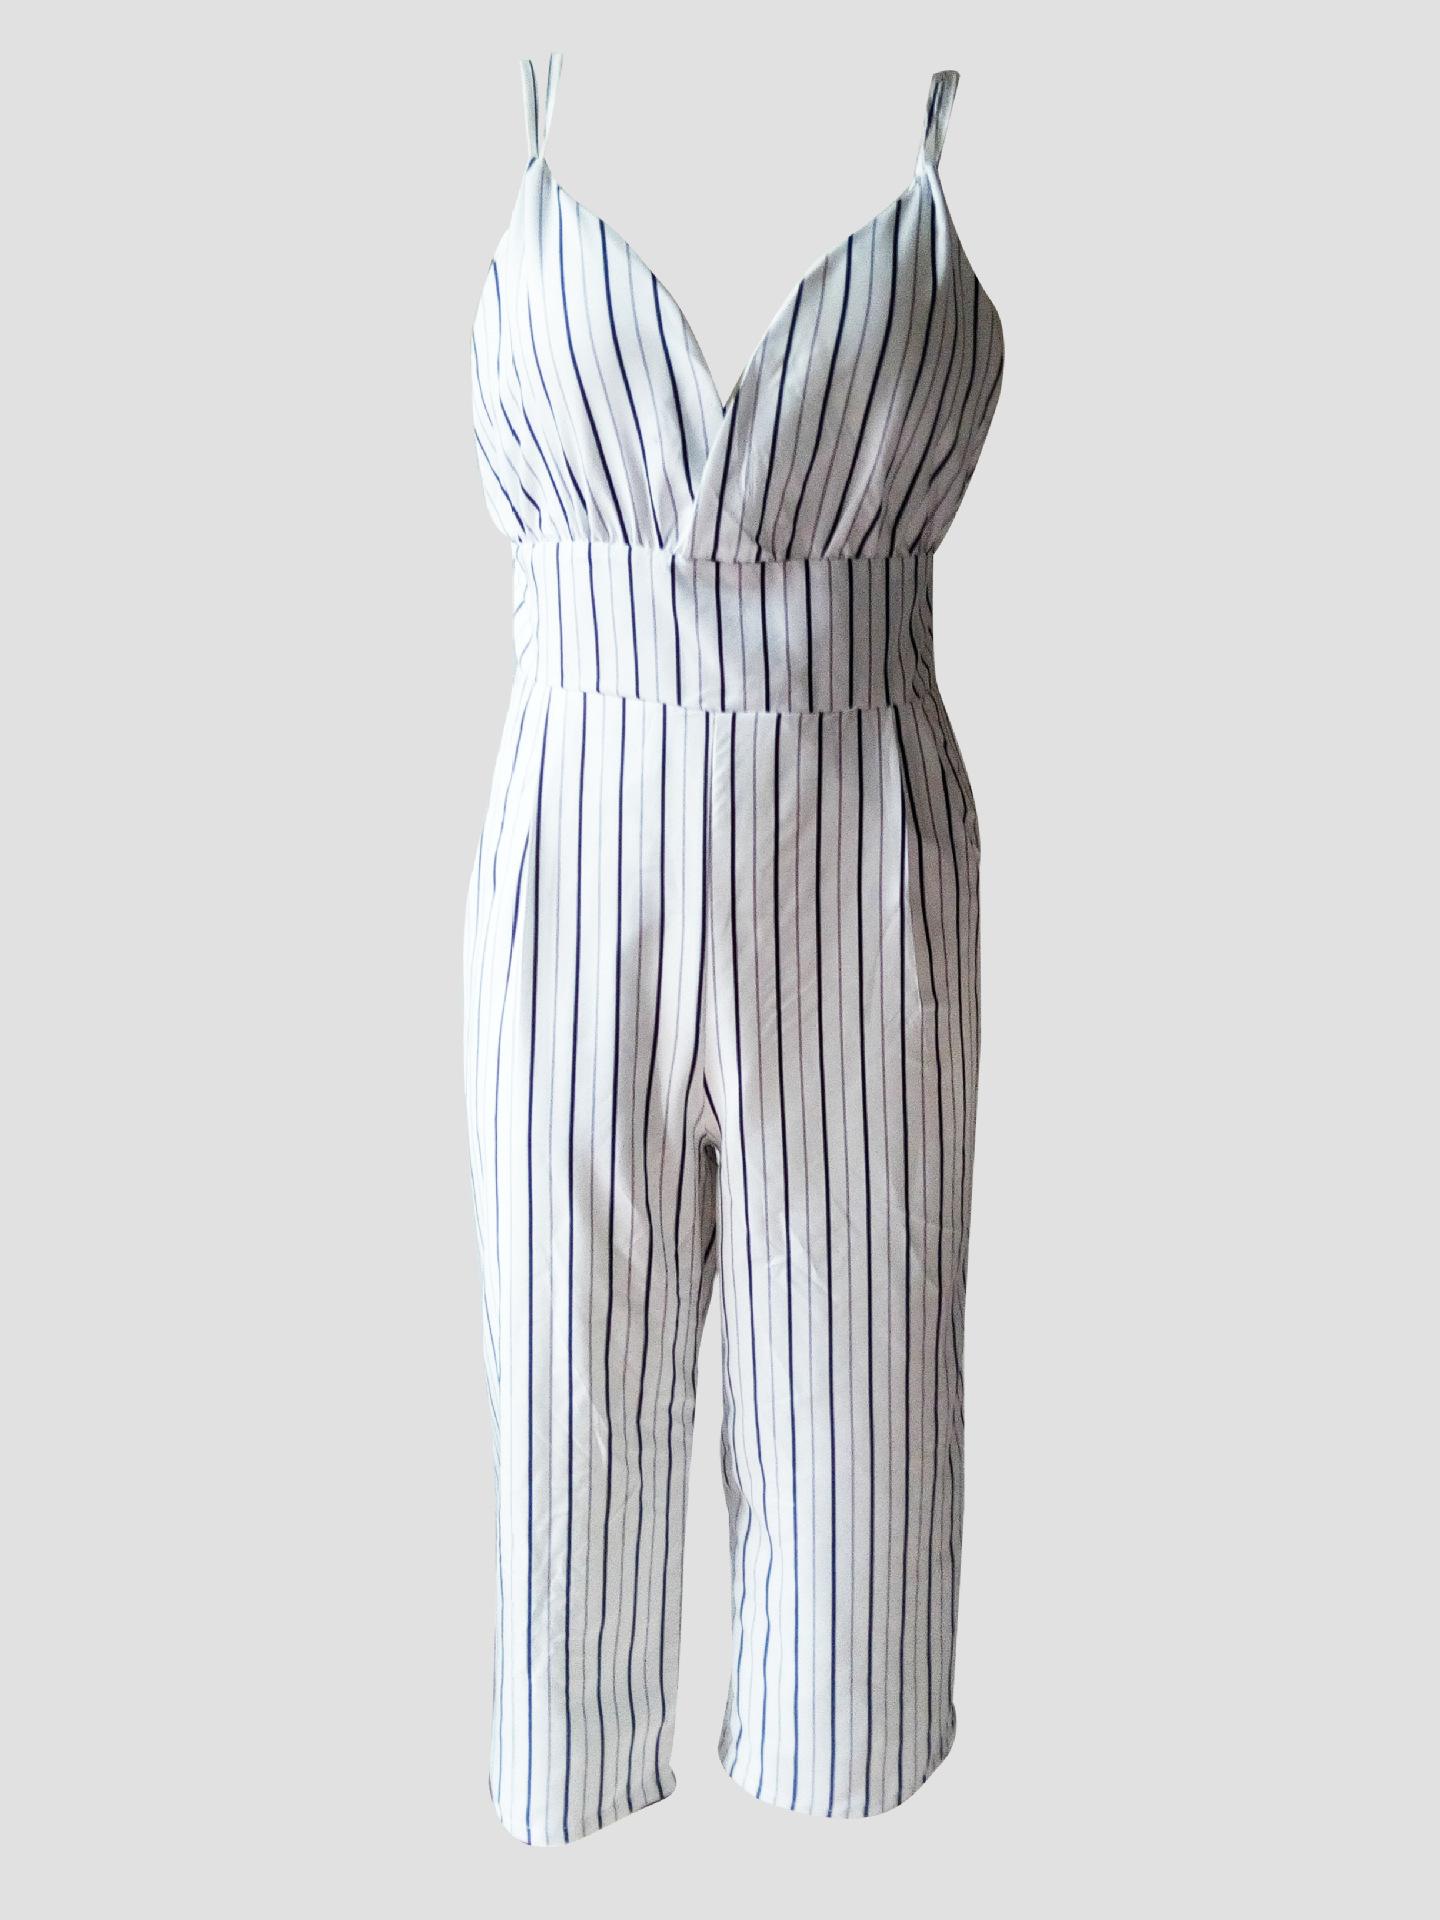 HTB1ReXtSXXXXXb6apXXq6xXFXXXU - FREE SHIPPING Women V-Neck Backless Strapless Striped Romper Playsuit Bodycon Club Jumpsuit Tops Outfits Sunsuit JKP377